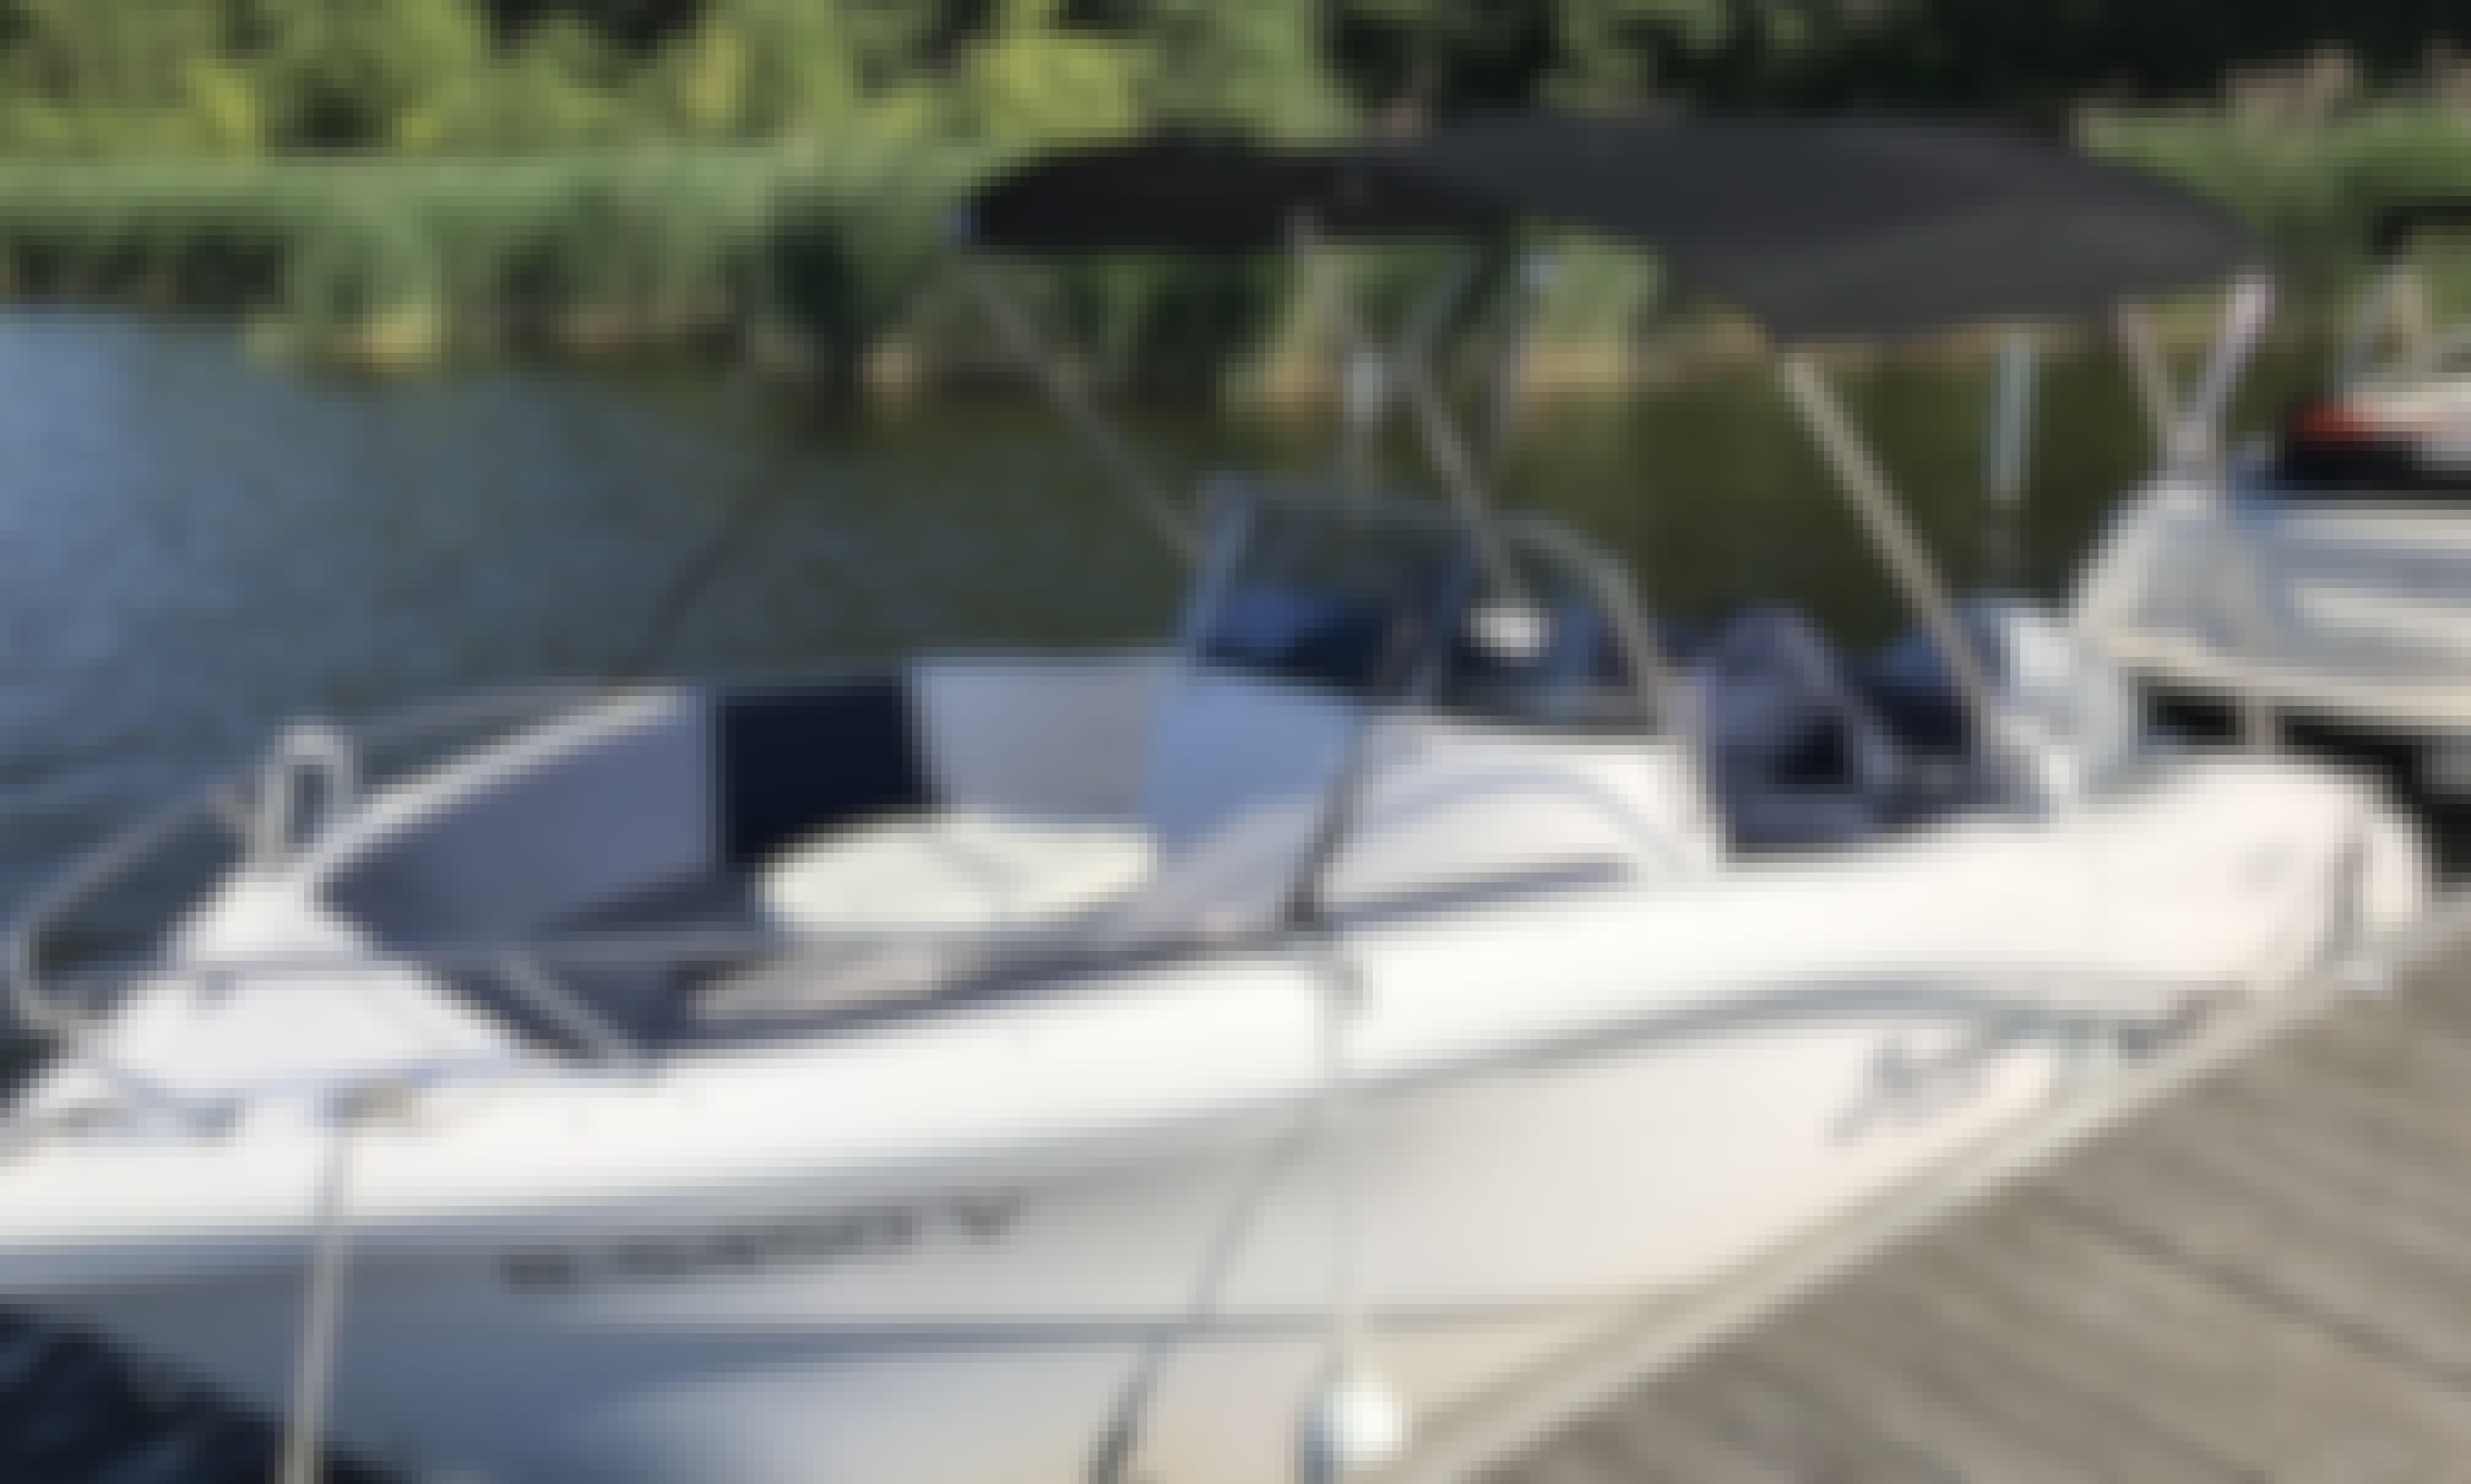 Barracuda 545 Powerboat 130 hp in Berlin